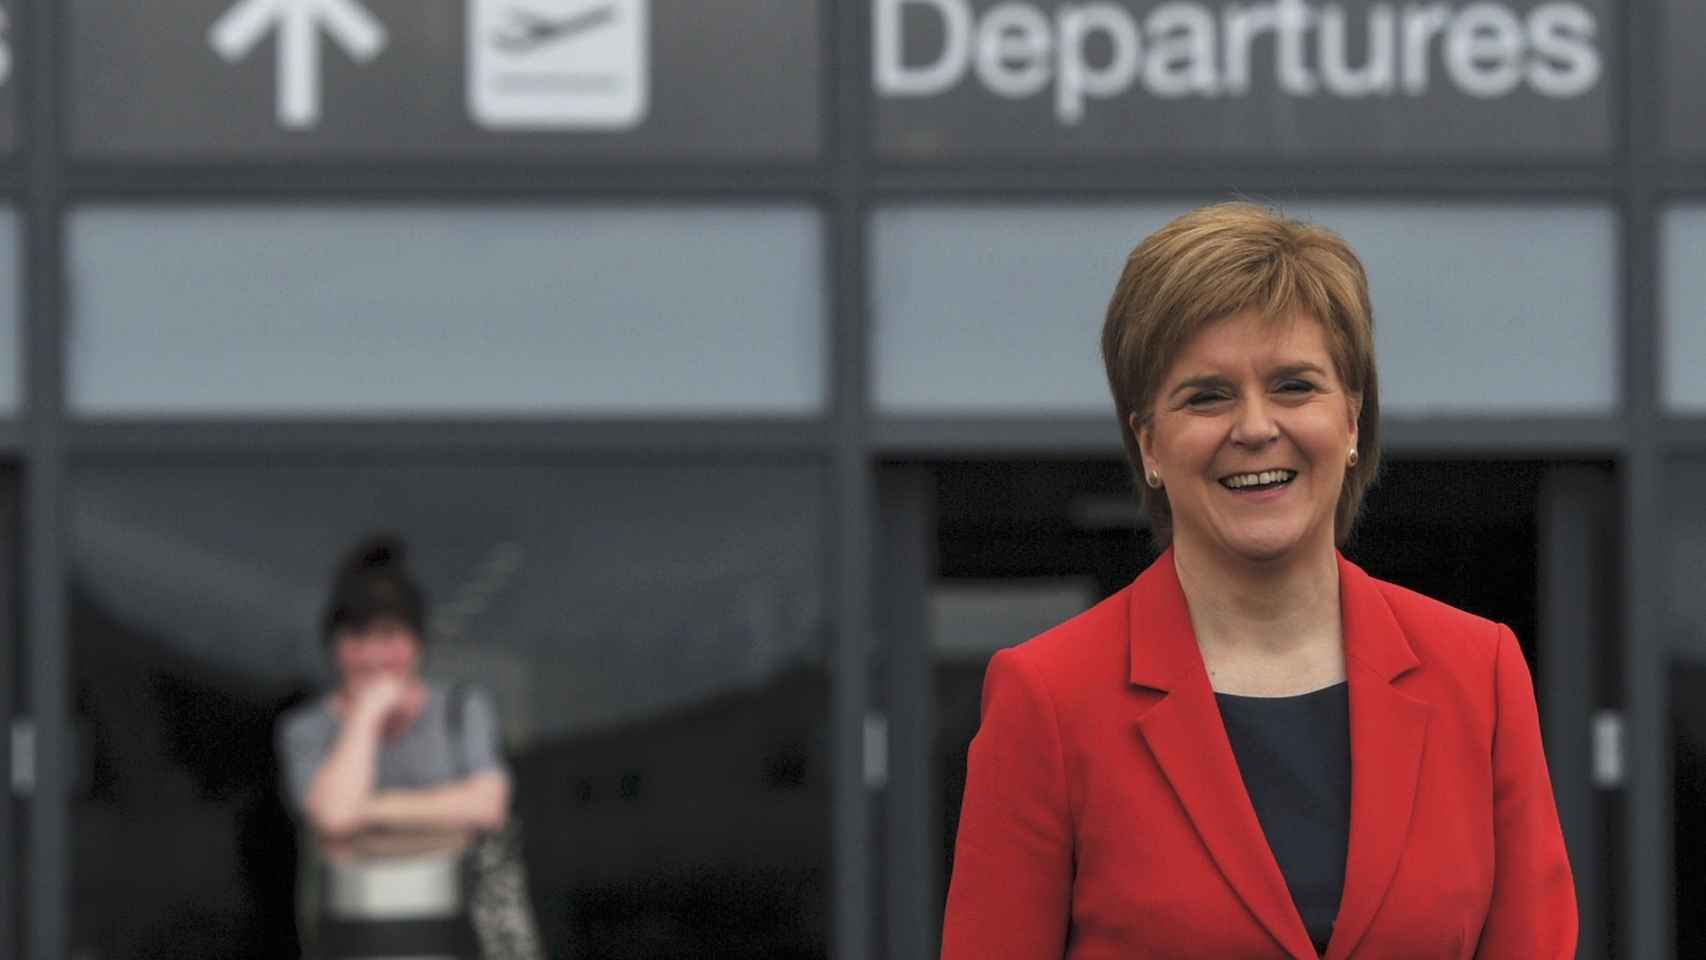 La primera ministro de Escocia, Nicola Sturgeon, en el aeropuerto de Edimburgo.